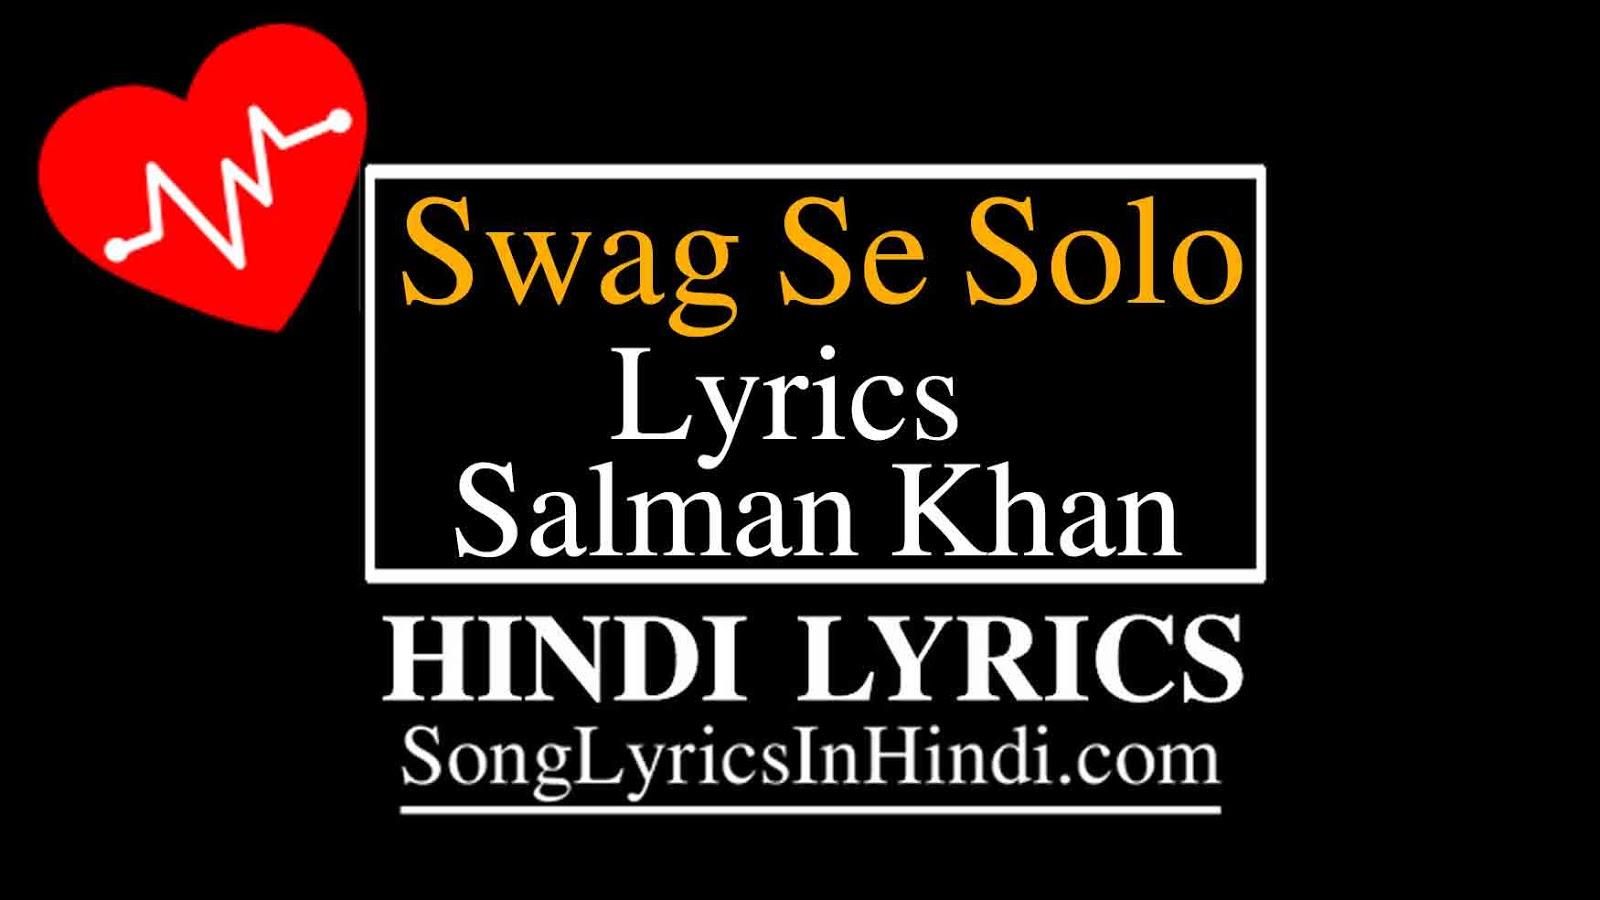 स्वैग से सोलो Lyrics Of Swag Se Solo In Hindi | Salman Khan |